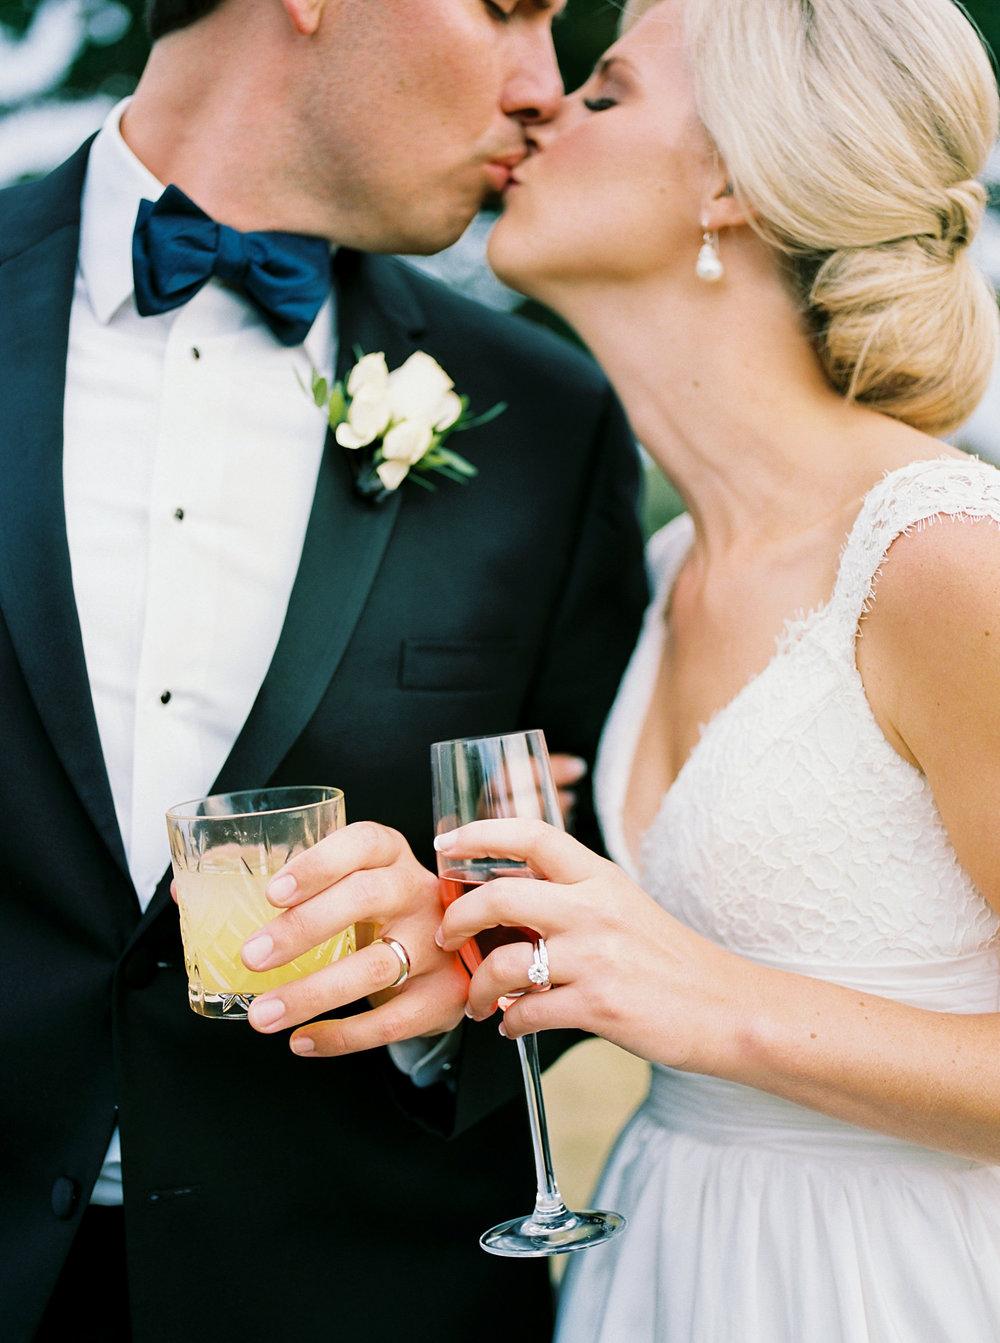 Alexandra-Elise-Photography-Ali-Reed-Chebeague-Island-Maine-Film-Wedding-Photographer-Elizabeth-Josh-Highlights-050.jpg